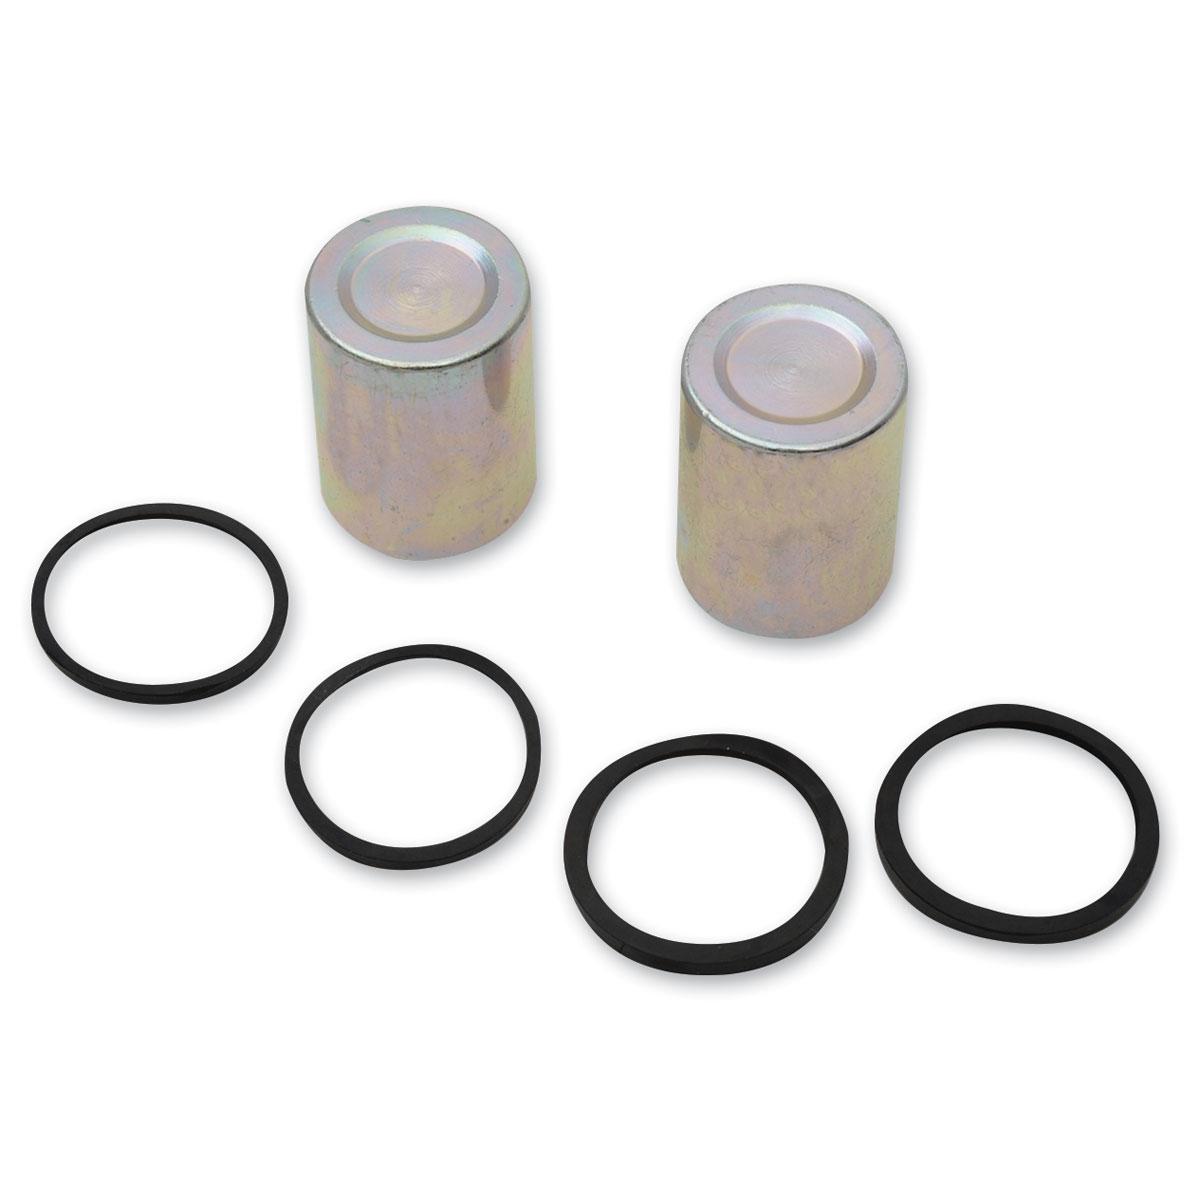 Cycle Pro Caliper Piston and seal rebuild kit